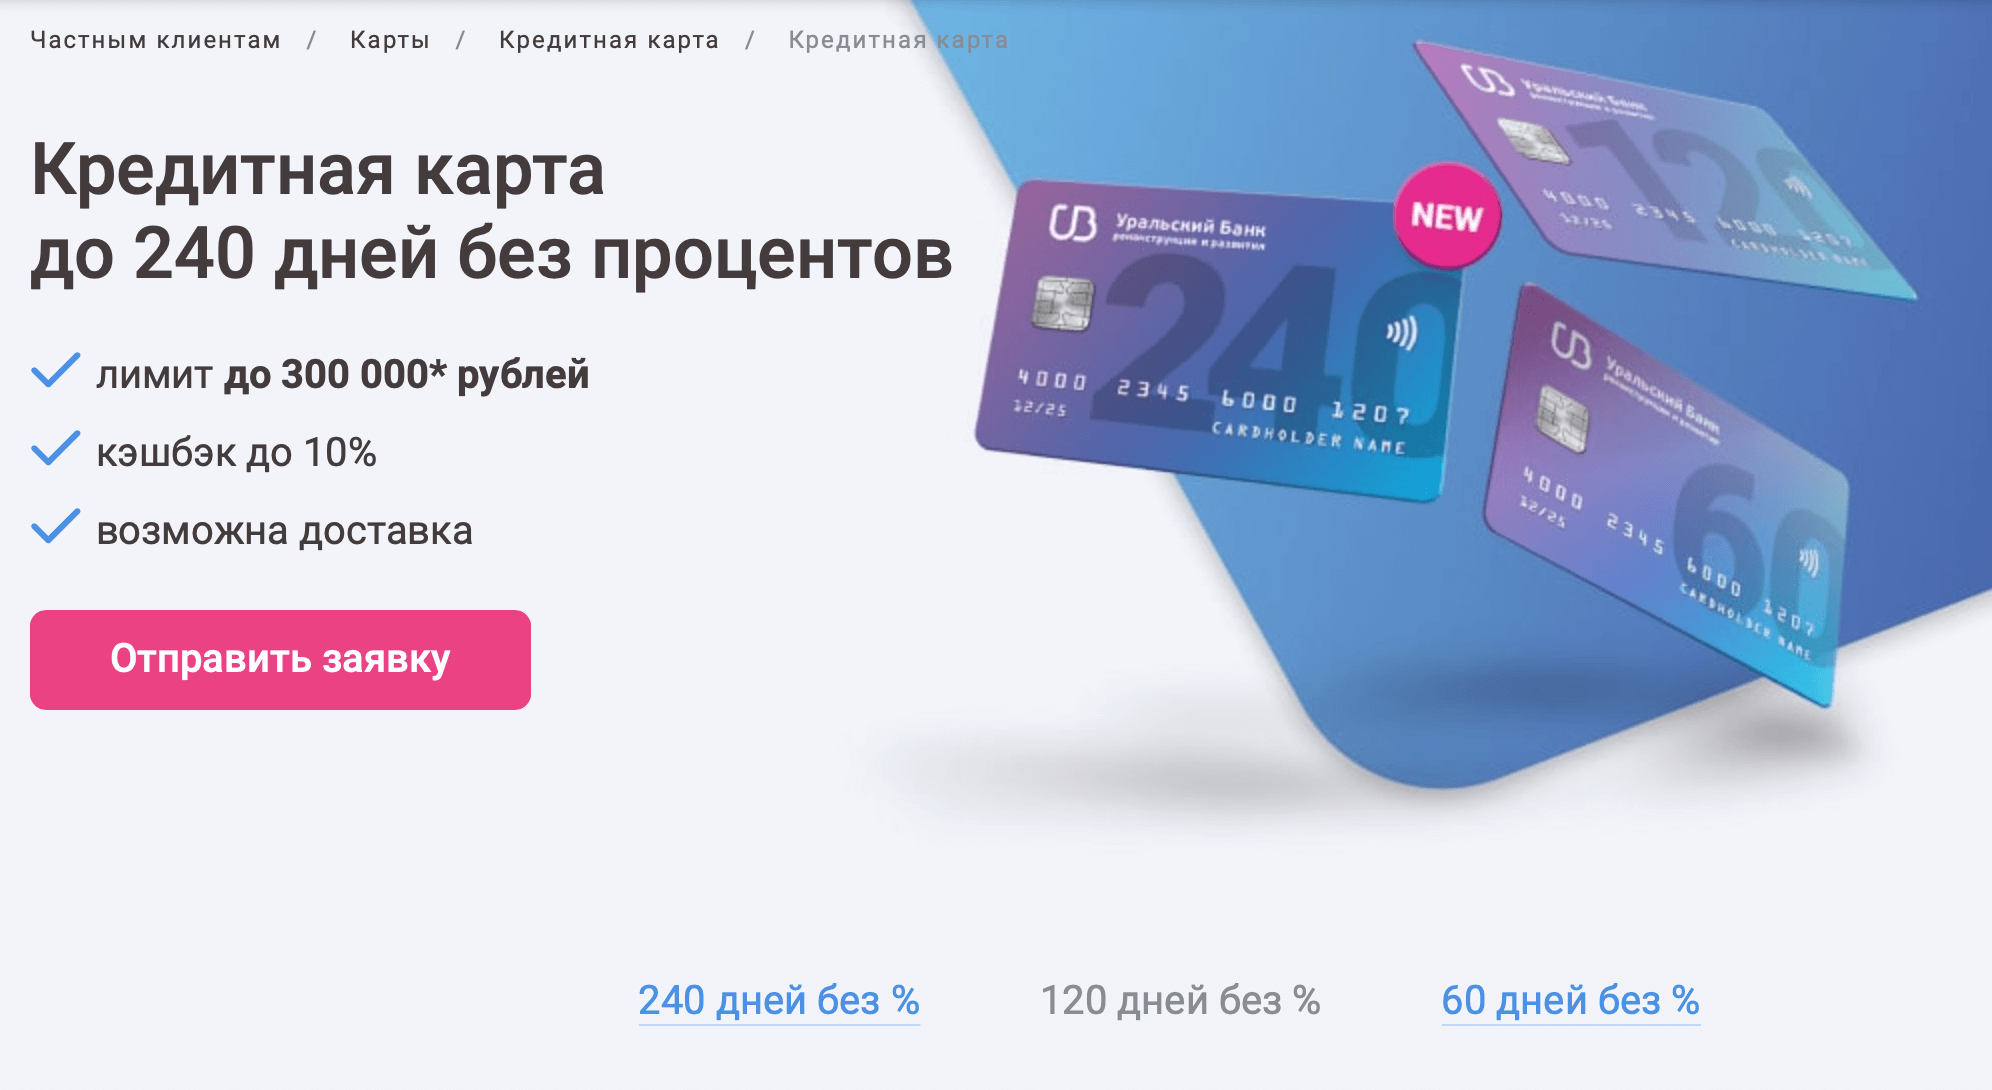 Убрир заказать кредитную карту онлайн